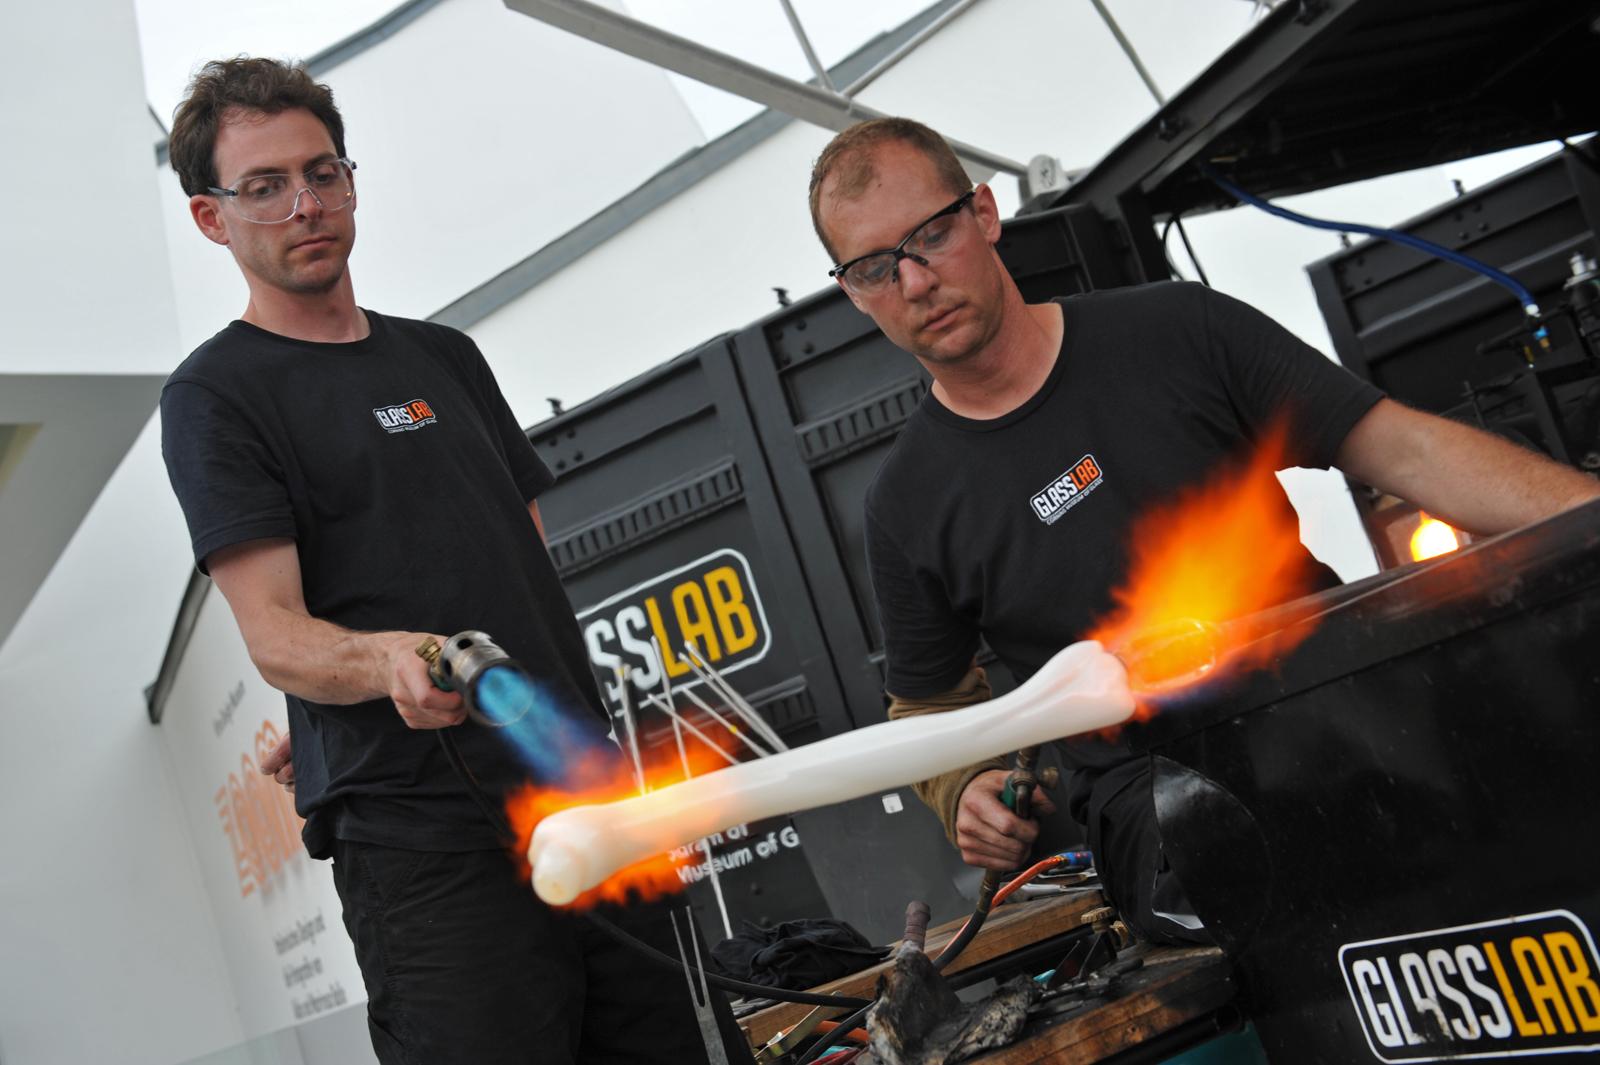 Glassmakers Dan Mirer and Eric Meek work on a design prototype by Sigga Heimis at GlassLab